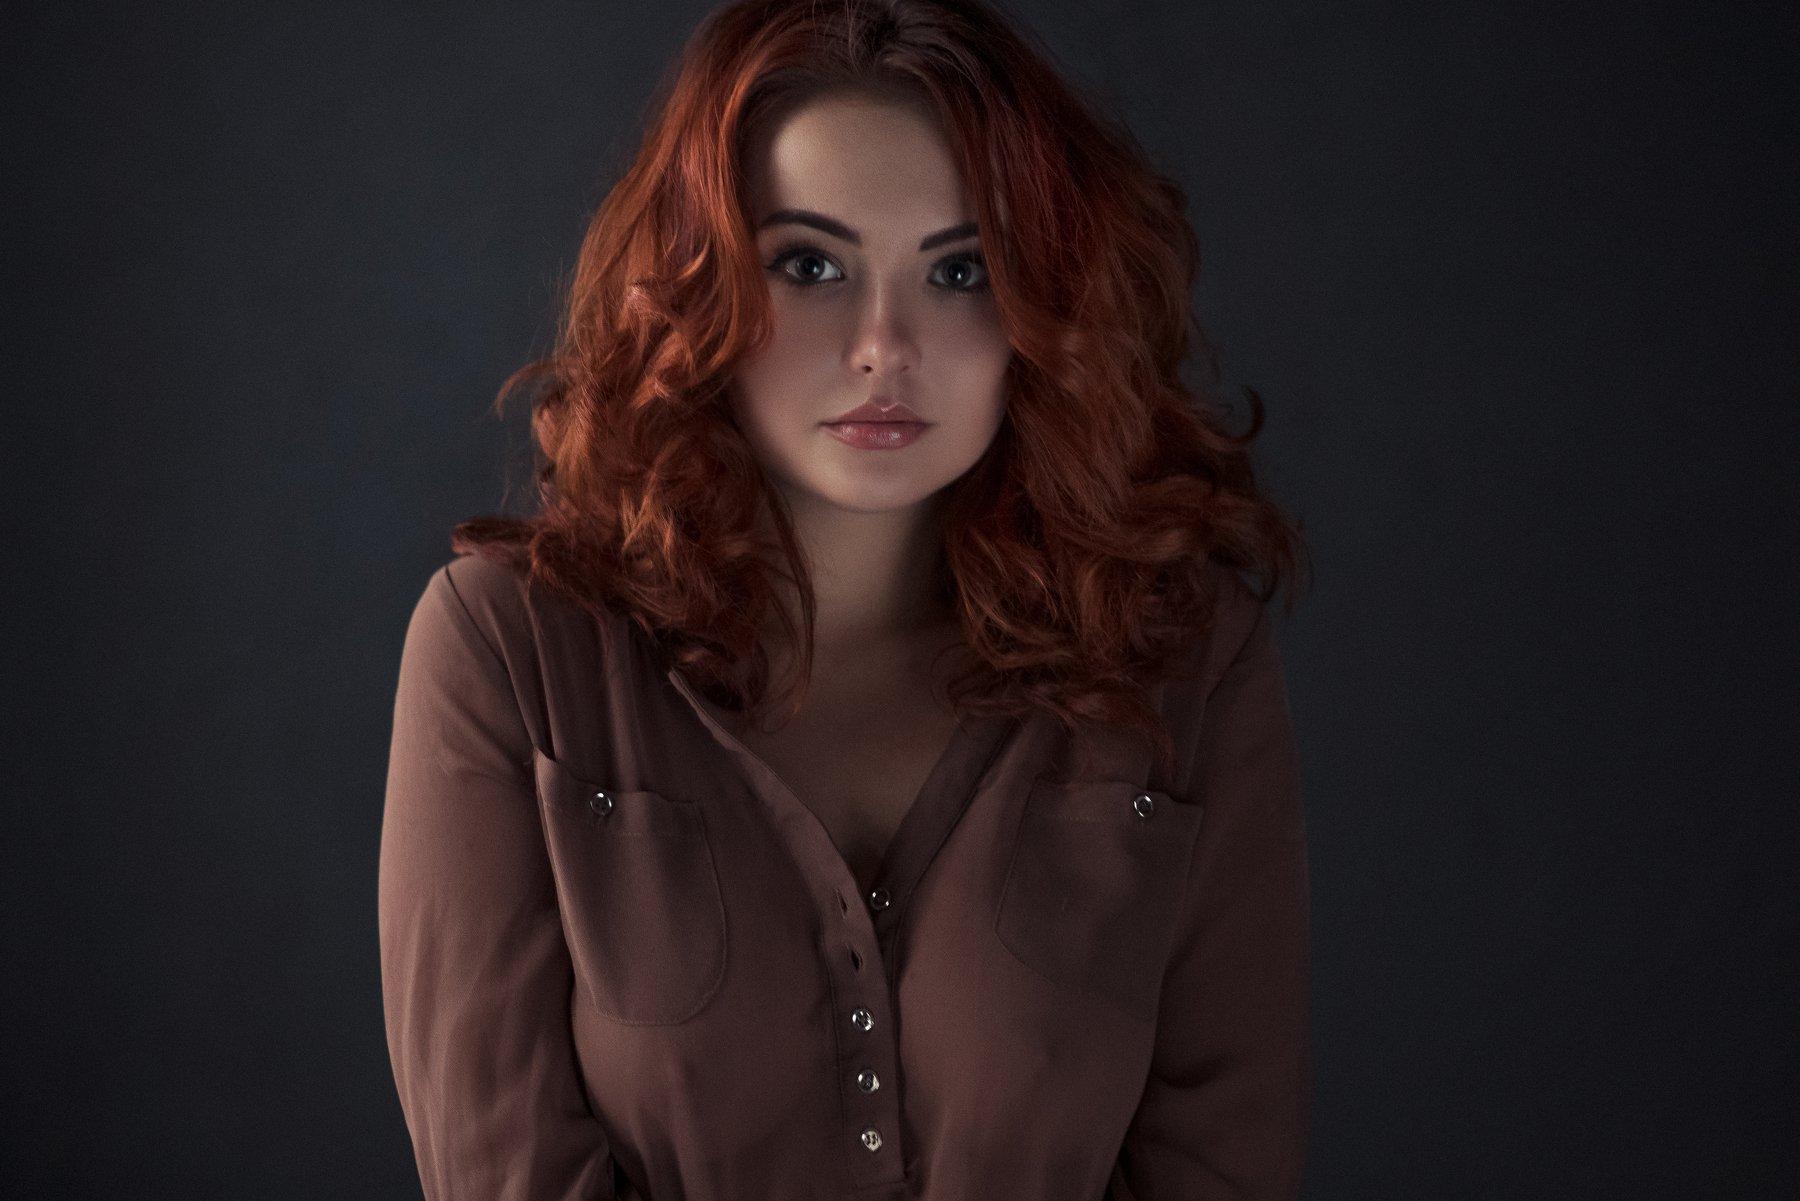 girl,portrait,color,pretty,sensual,cute,redhead,window light, natural light, Андрей Фирсов